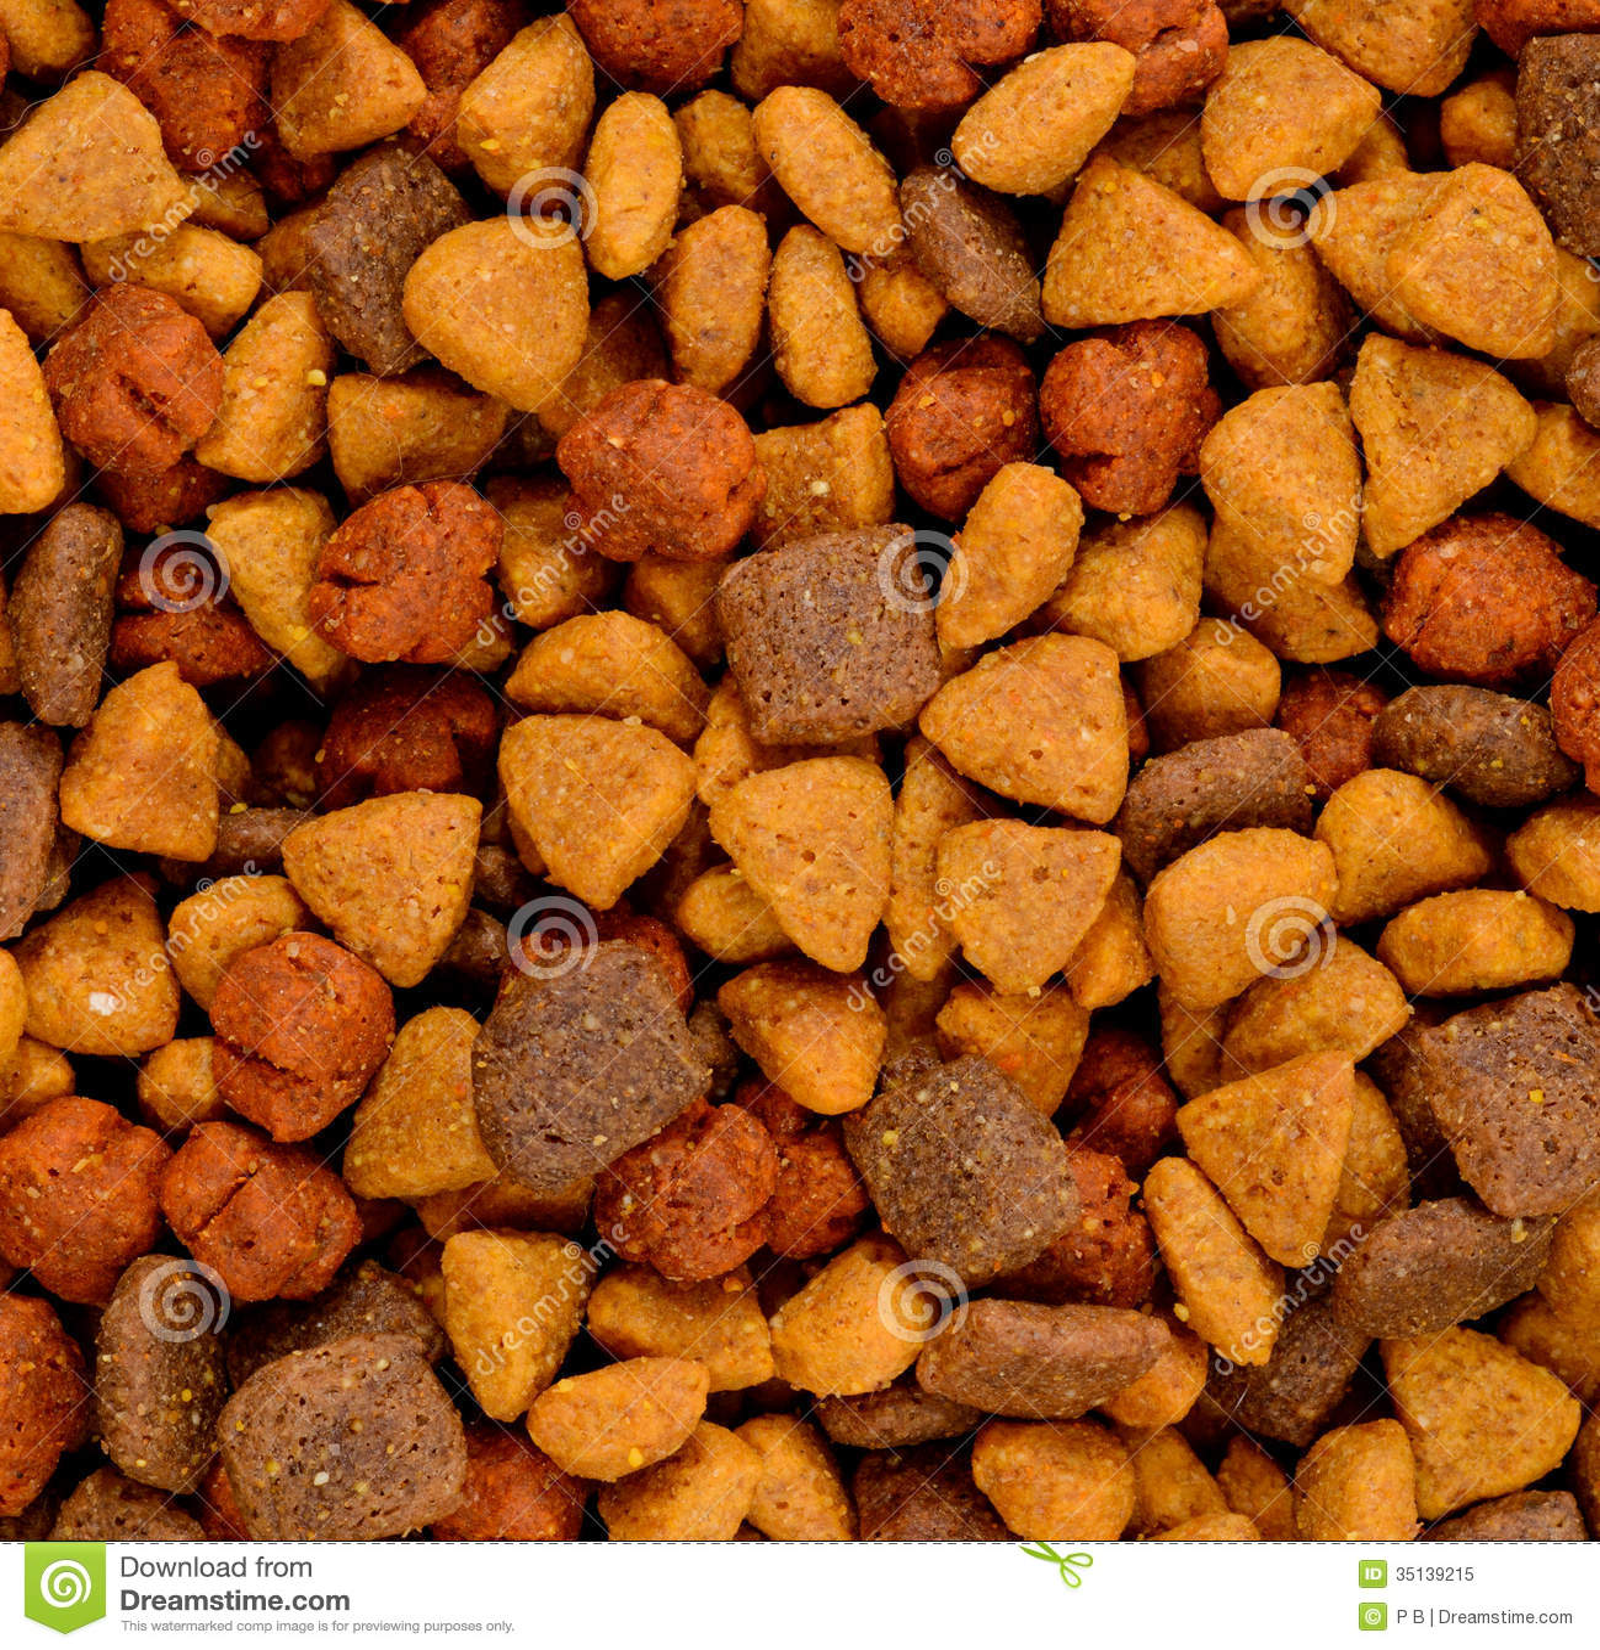 Dry Dog Food Royalty Free Stock Photo - Image: 35139215